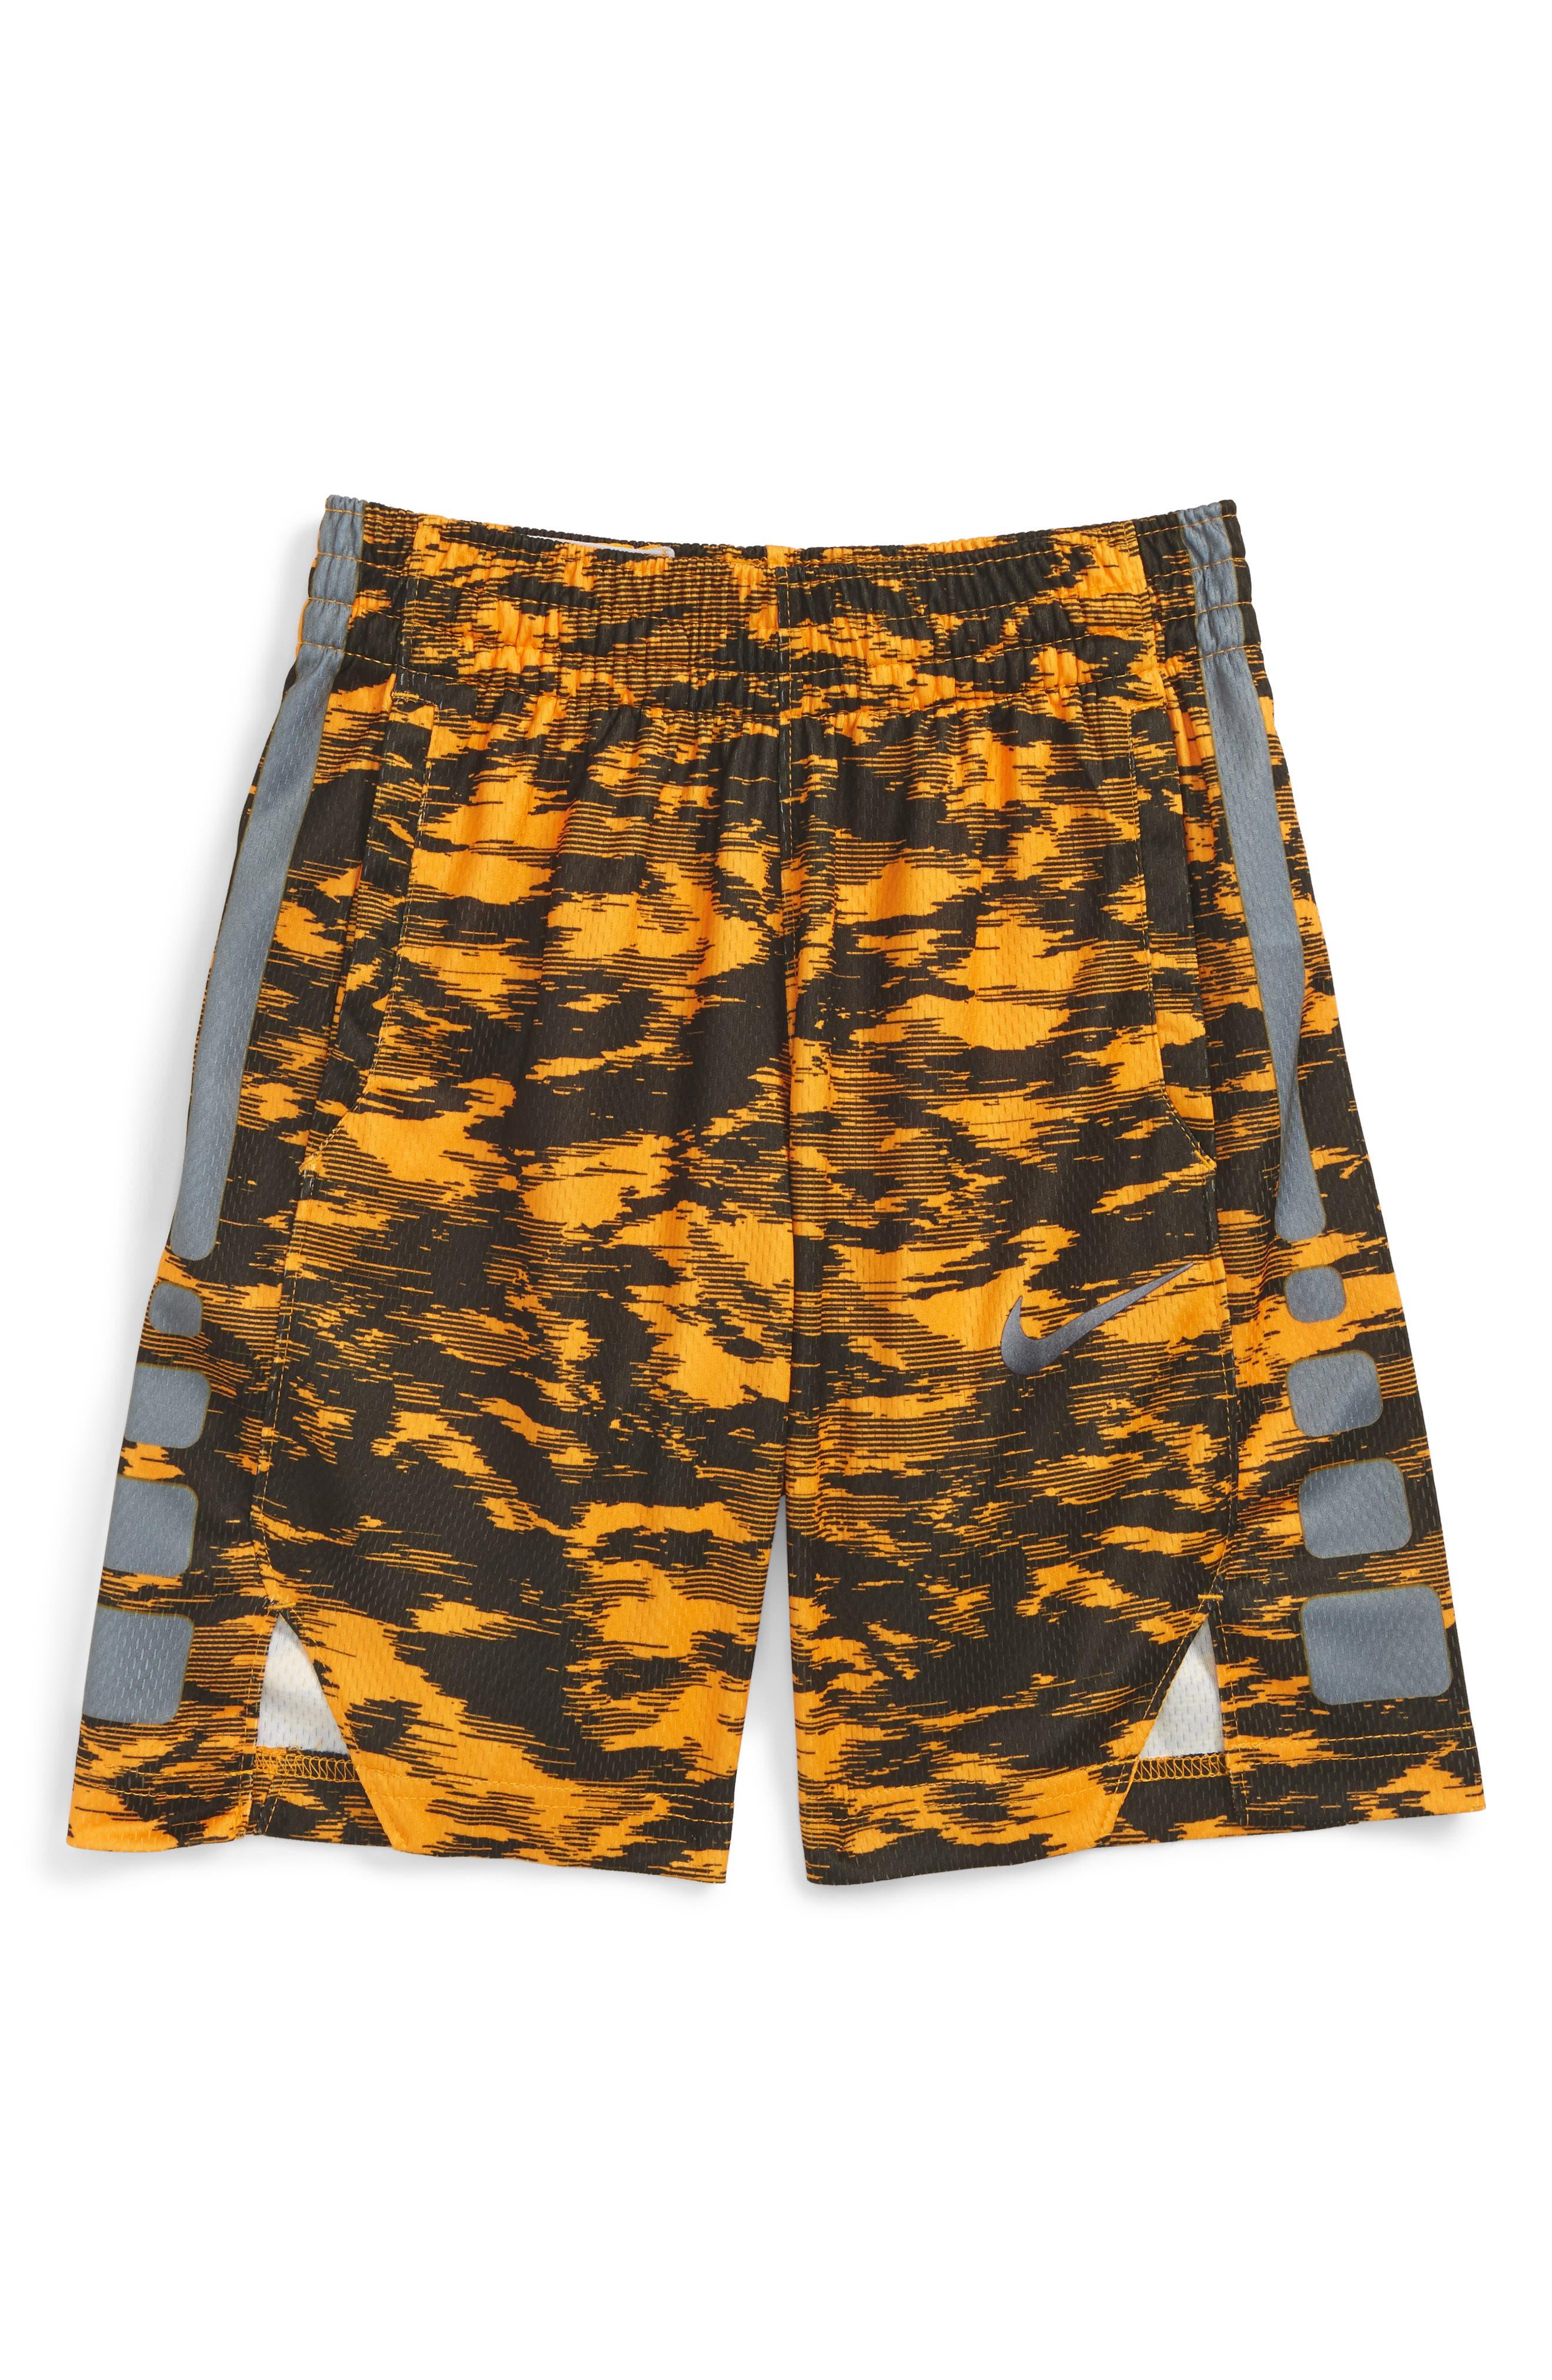 Dry Elite Basketball Shorts,                             Main thumbnail 8, color,